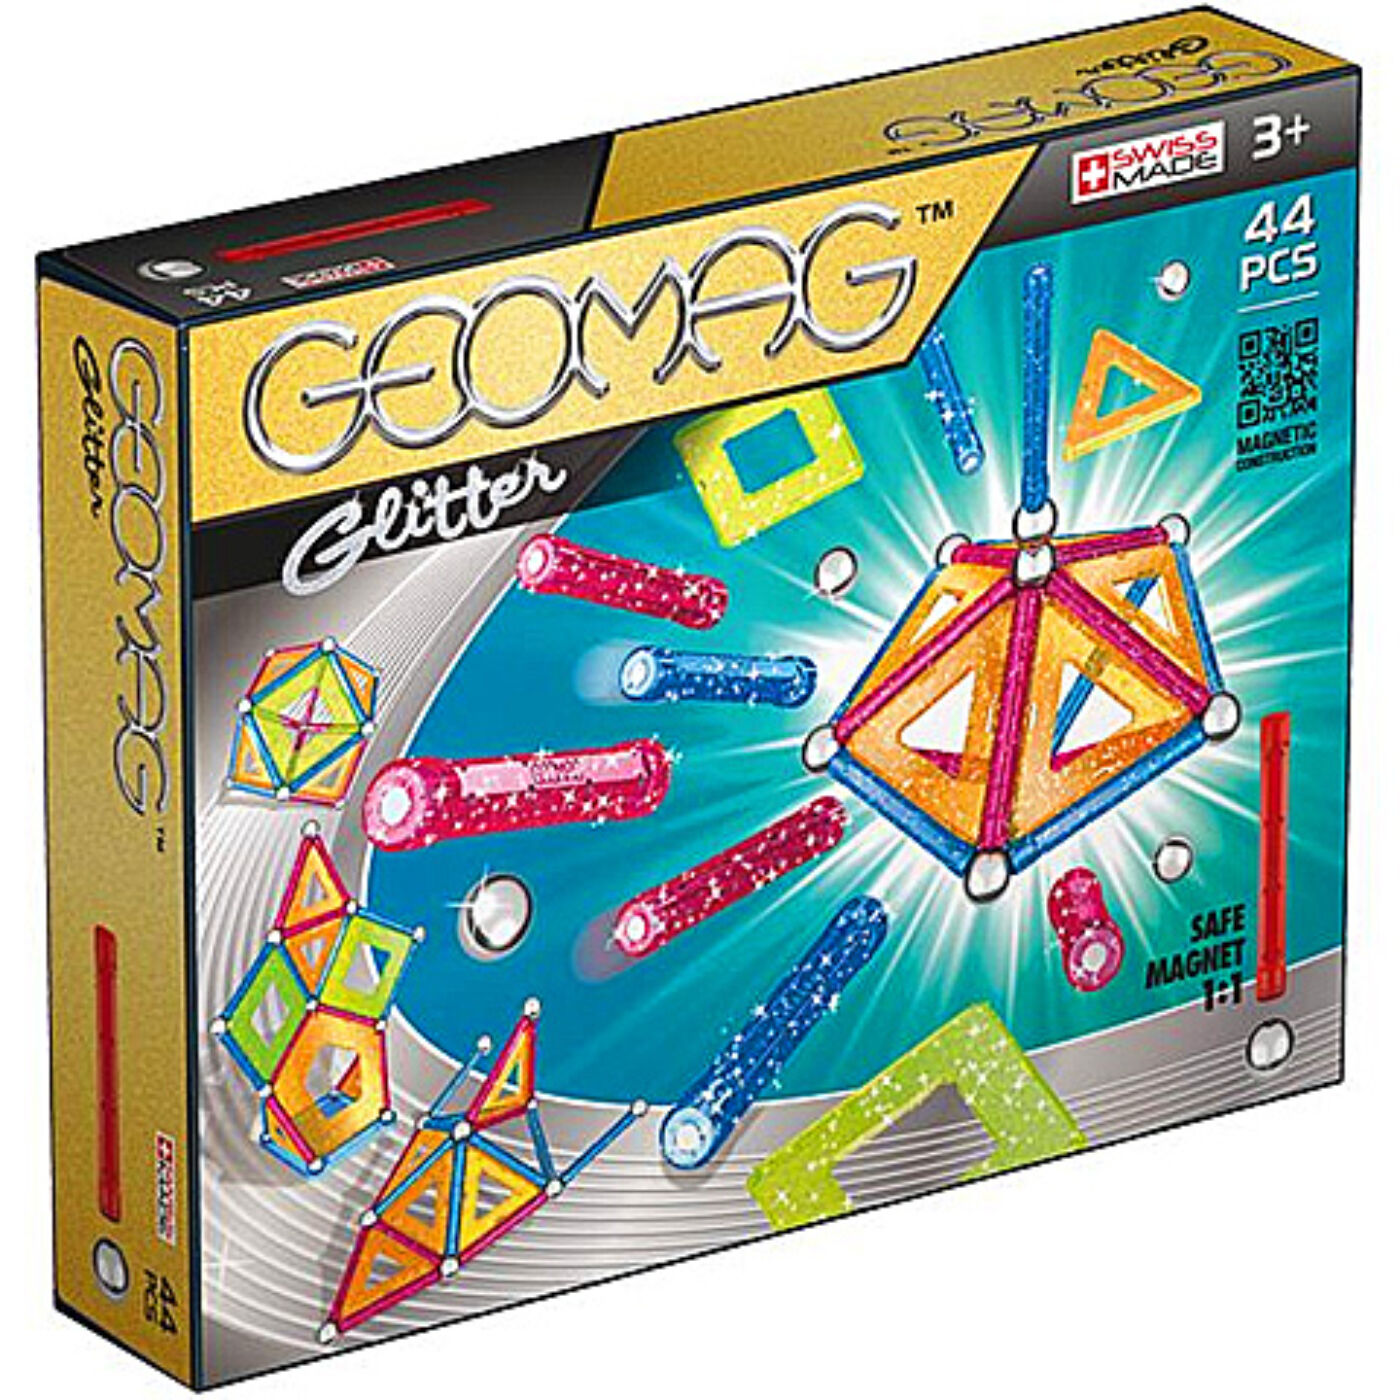 Geomag csillogós 44 db